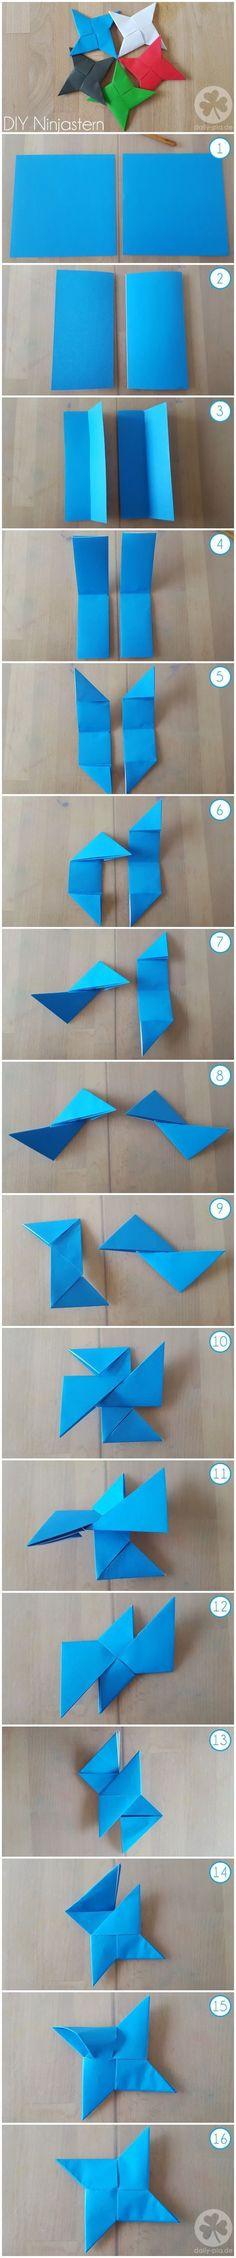 DIY Anleitung Ninjastern / Wurfstern aus Papier (Origami) für eine Ninja oder Ninjago Geburtstags-Party #DIY #Ninja #Geburtstag #Party